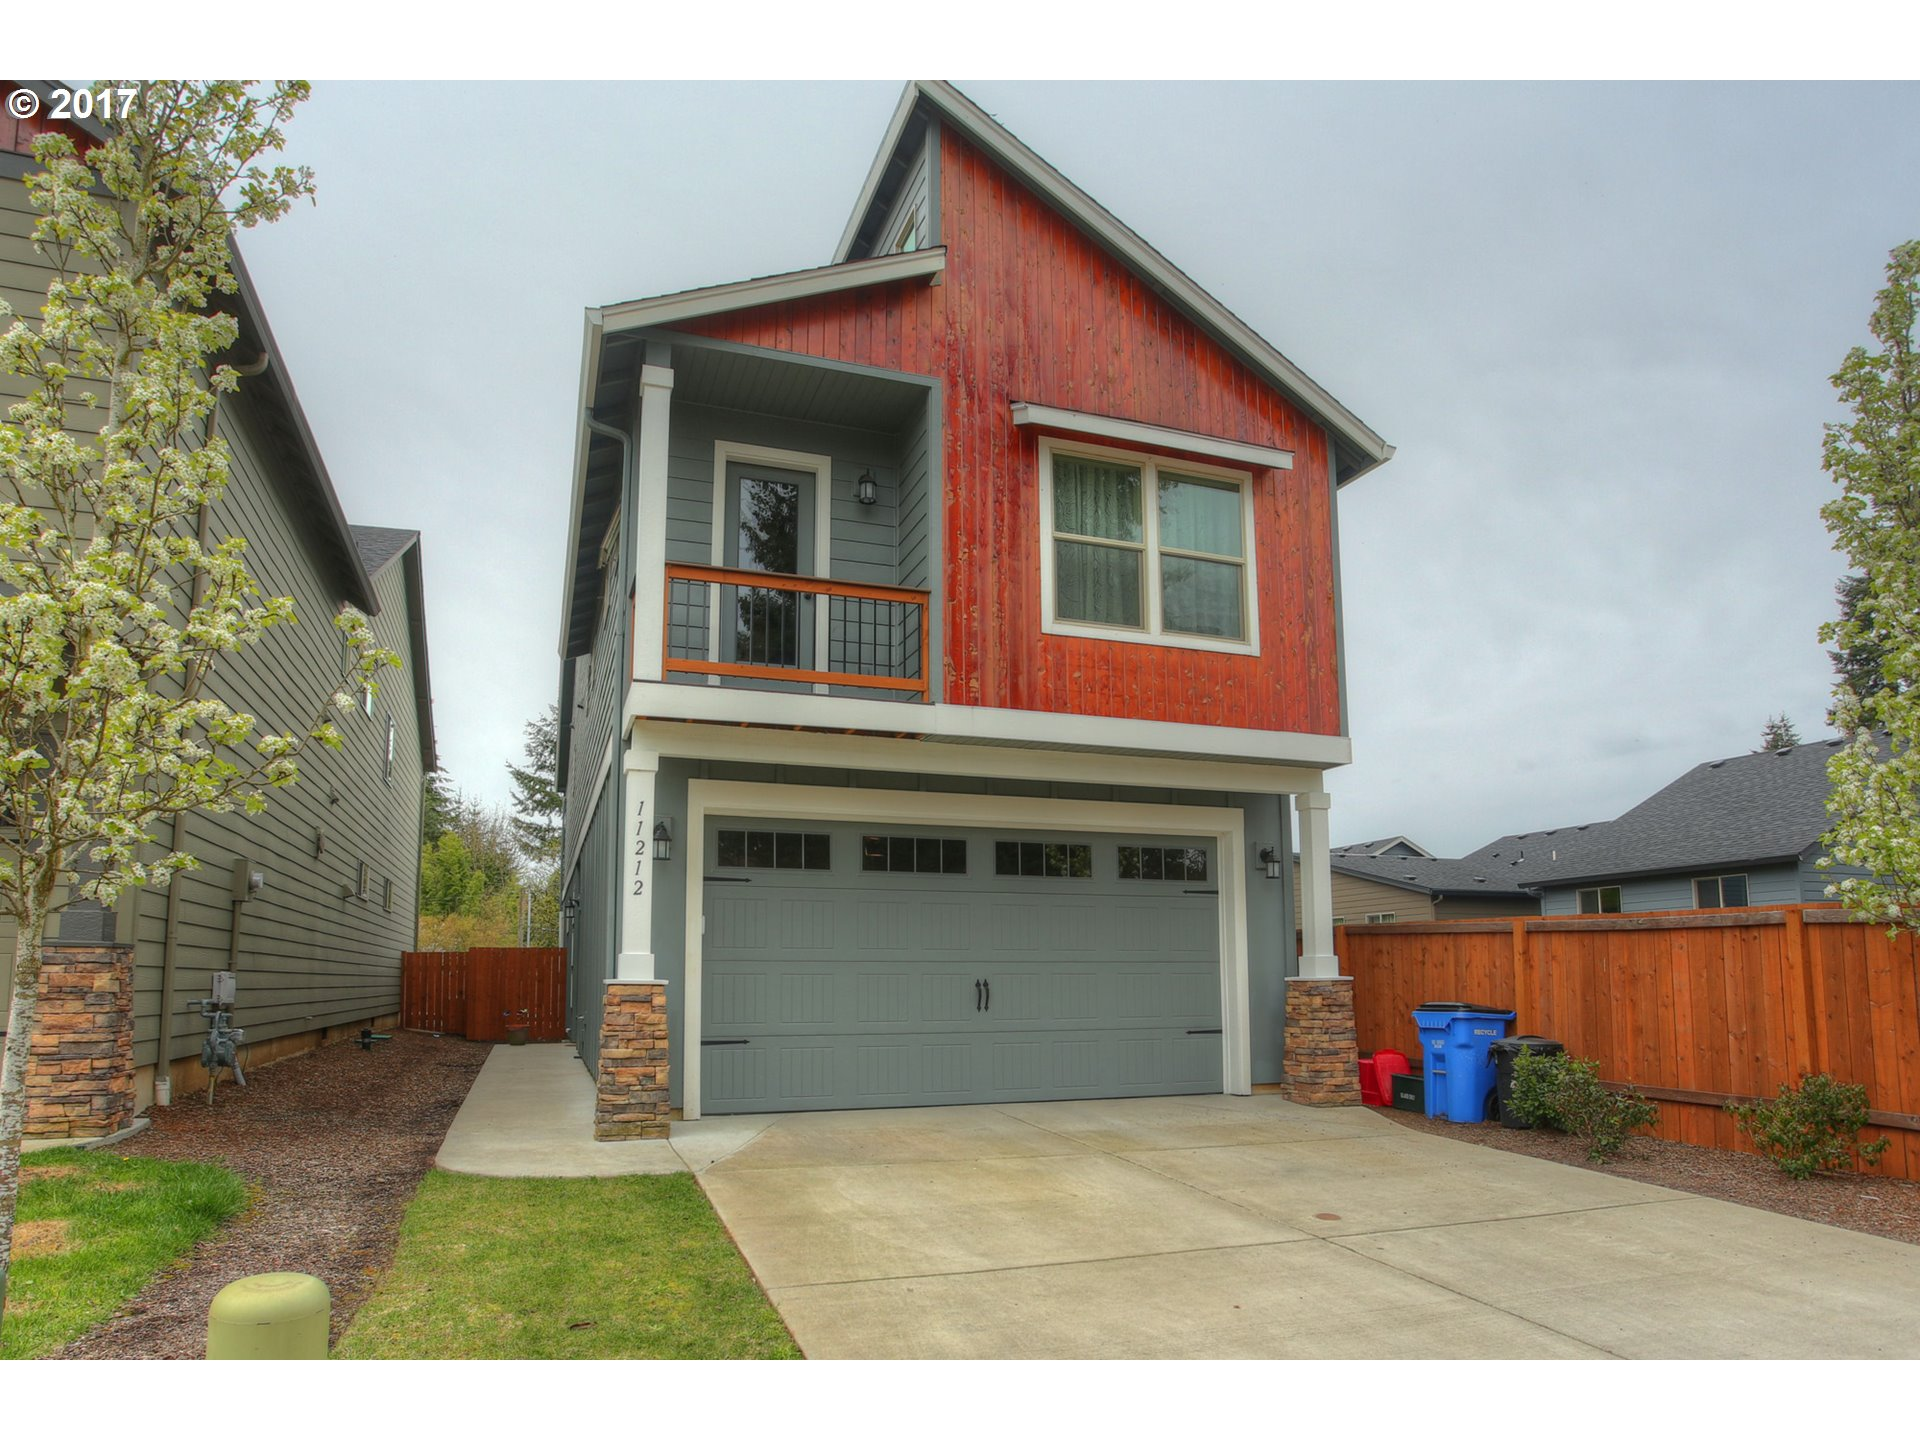 11212 NE 44TH CT, Vancouver, WA 98686